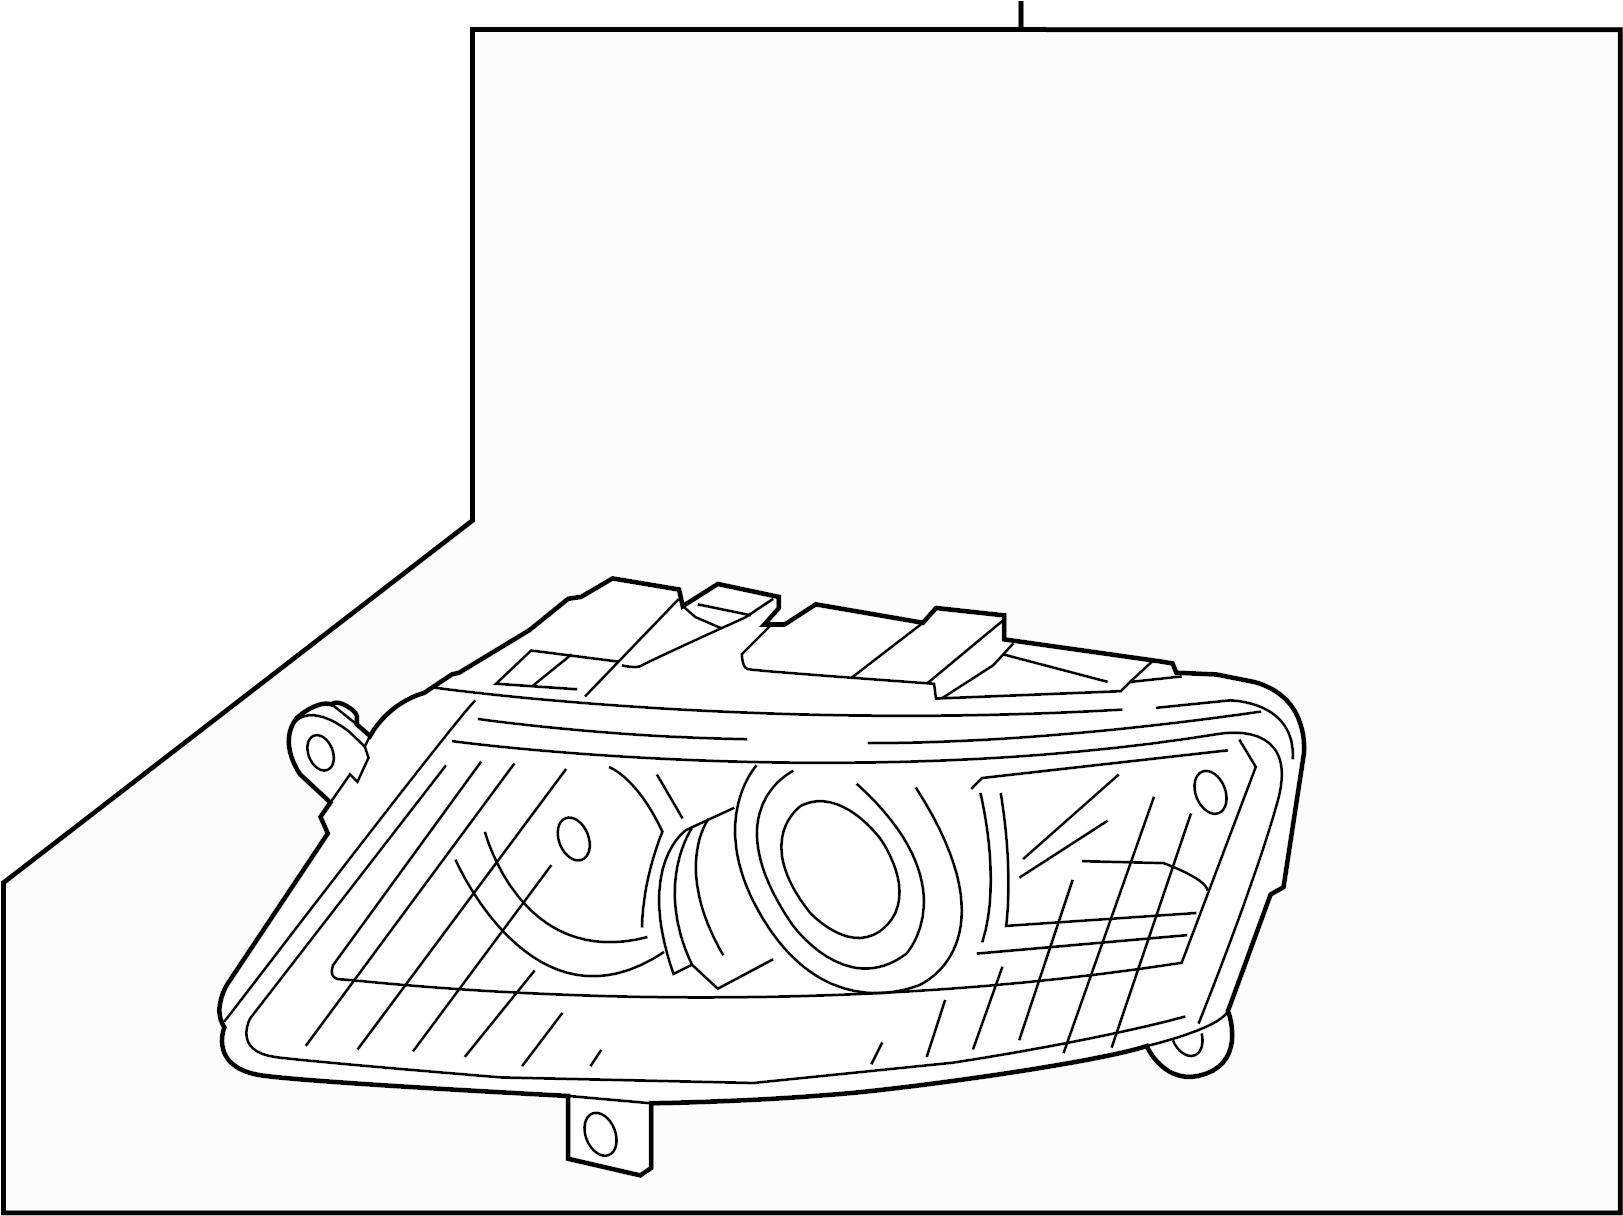 Audi A6 Headlight. 2005-08, W/XENON HEADLAMPS, W/O